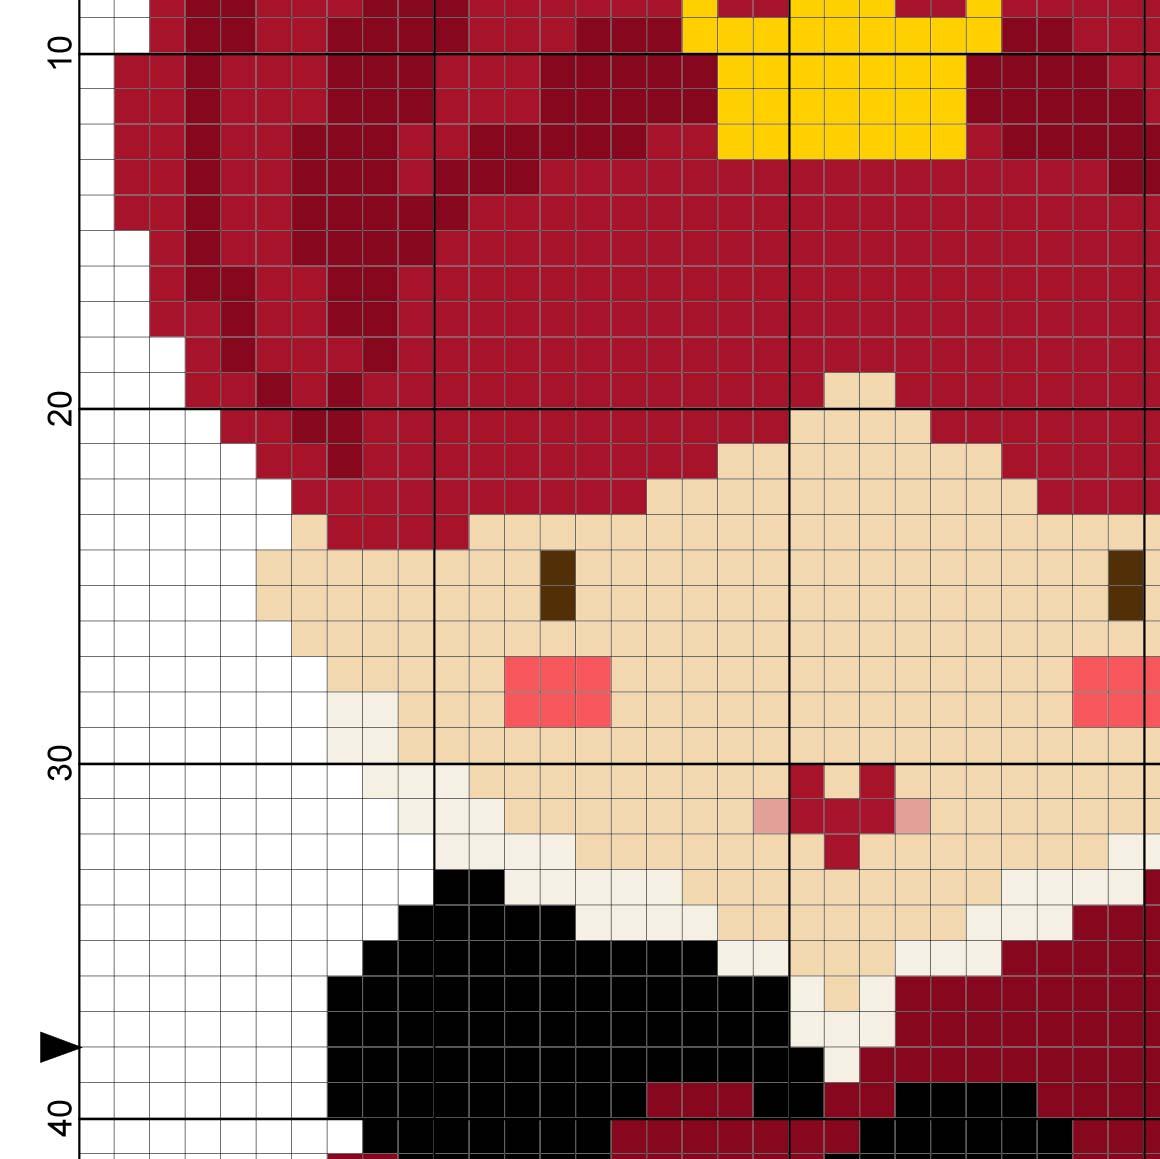 Red Queen Cross Stitch Pattern Daily Cross Stitch